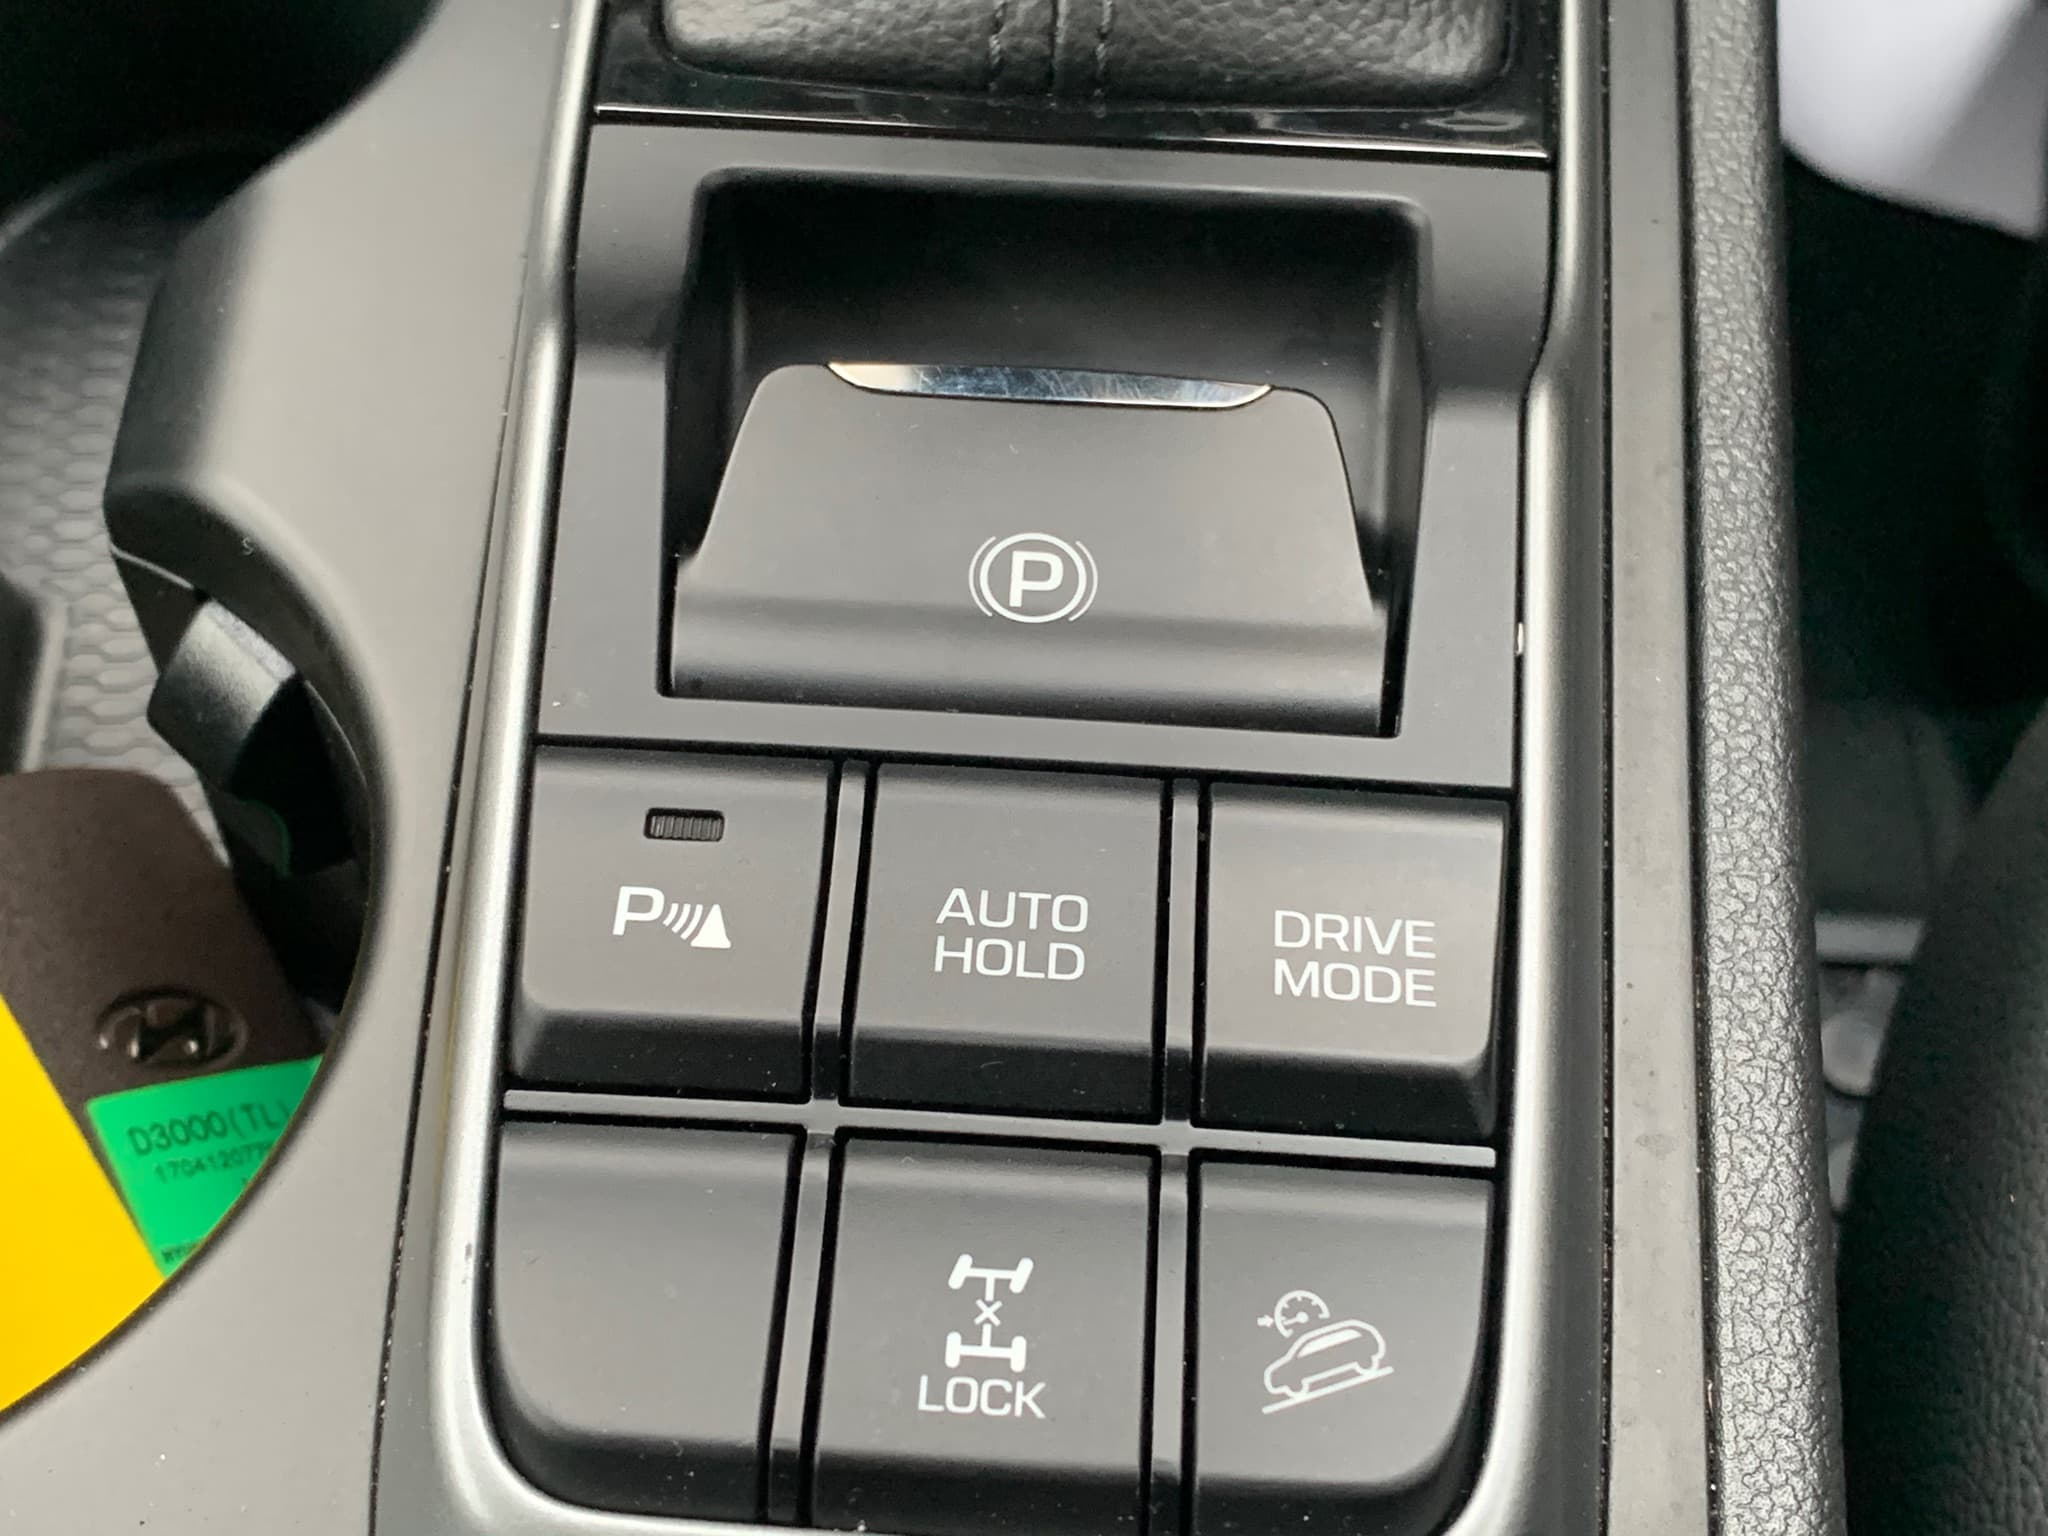 2018 Hyundai Tucson Highlander Auto AWD MY18 - image 30